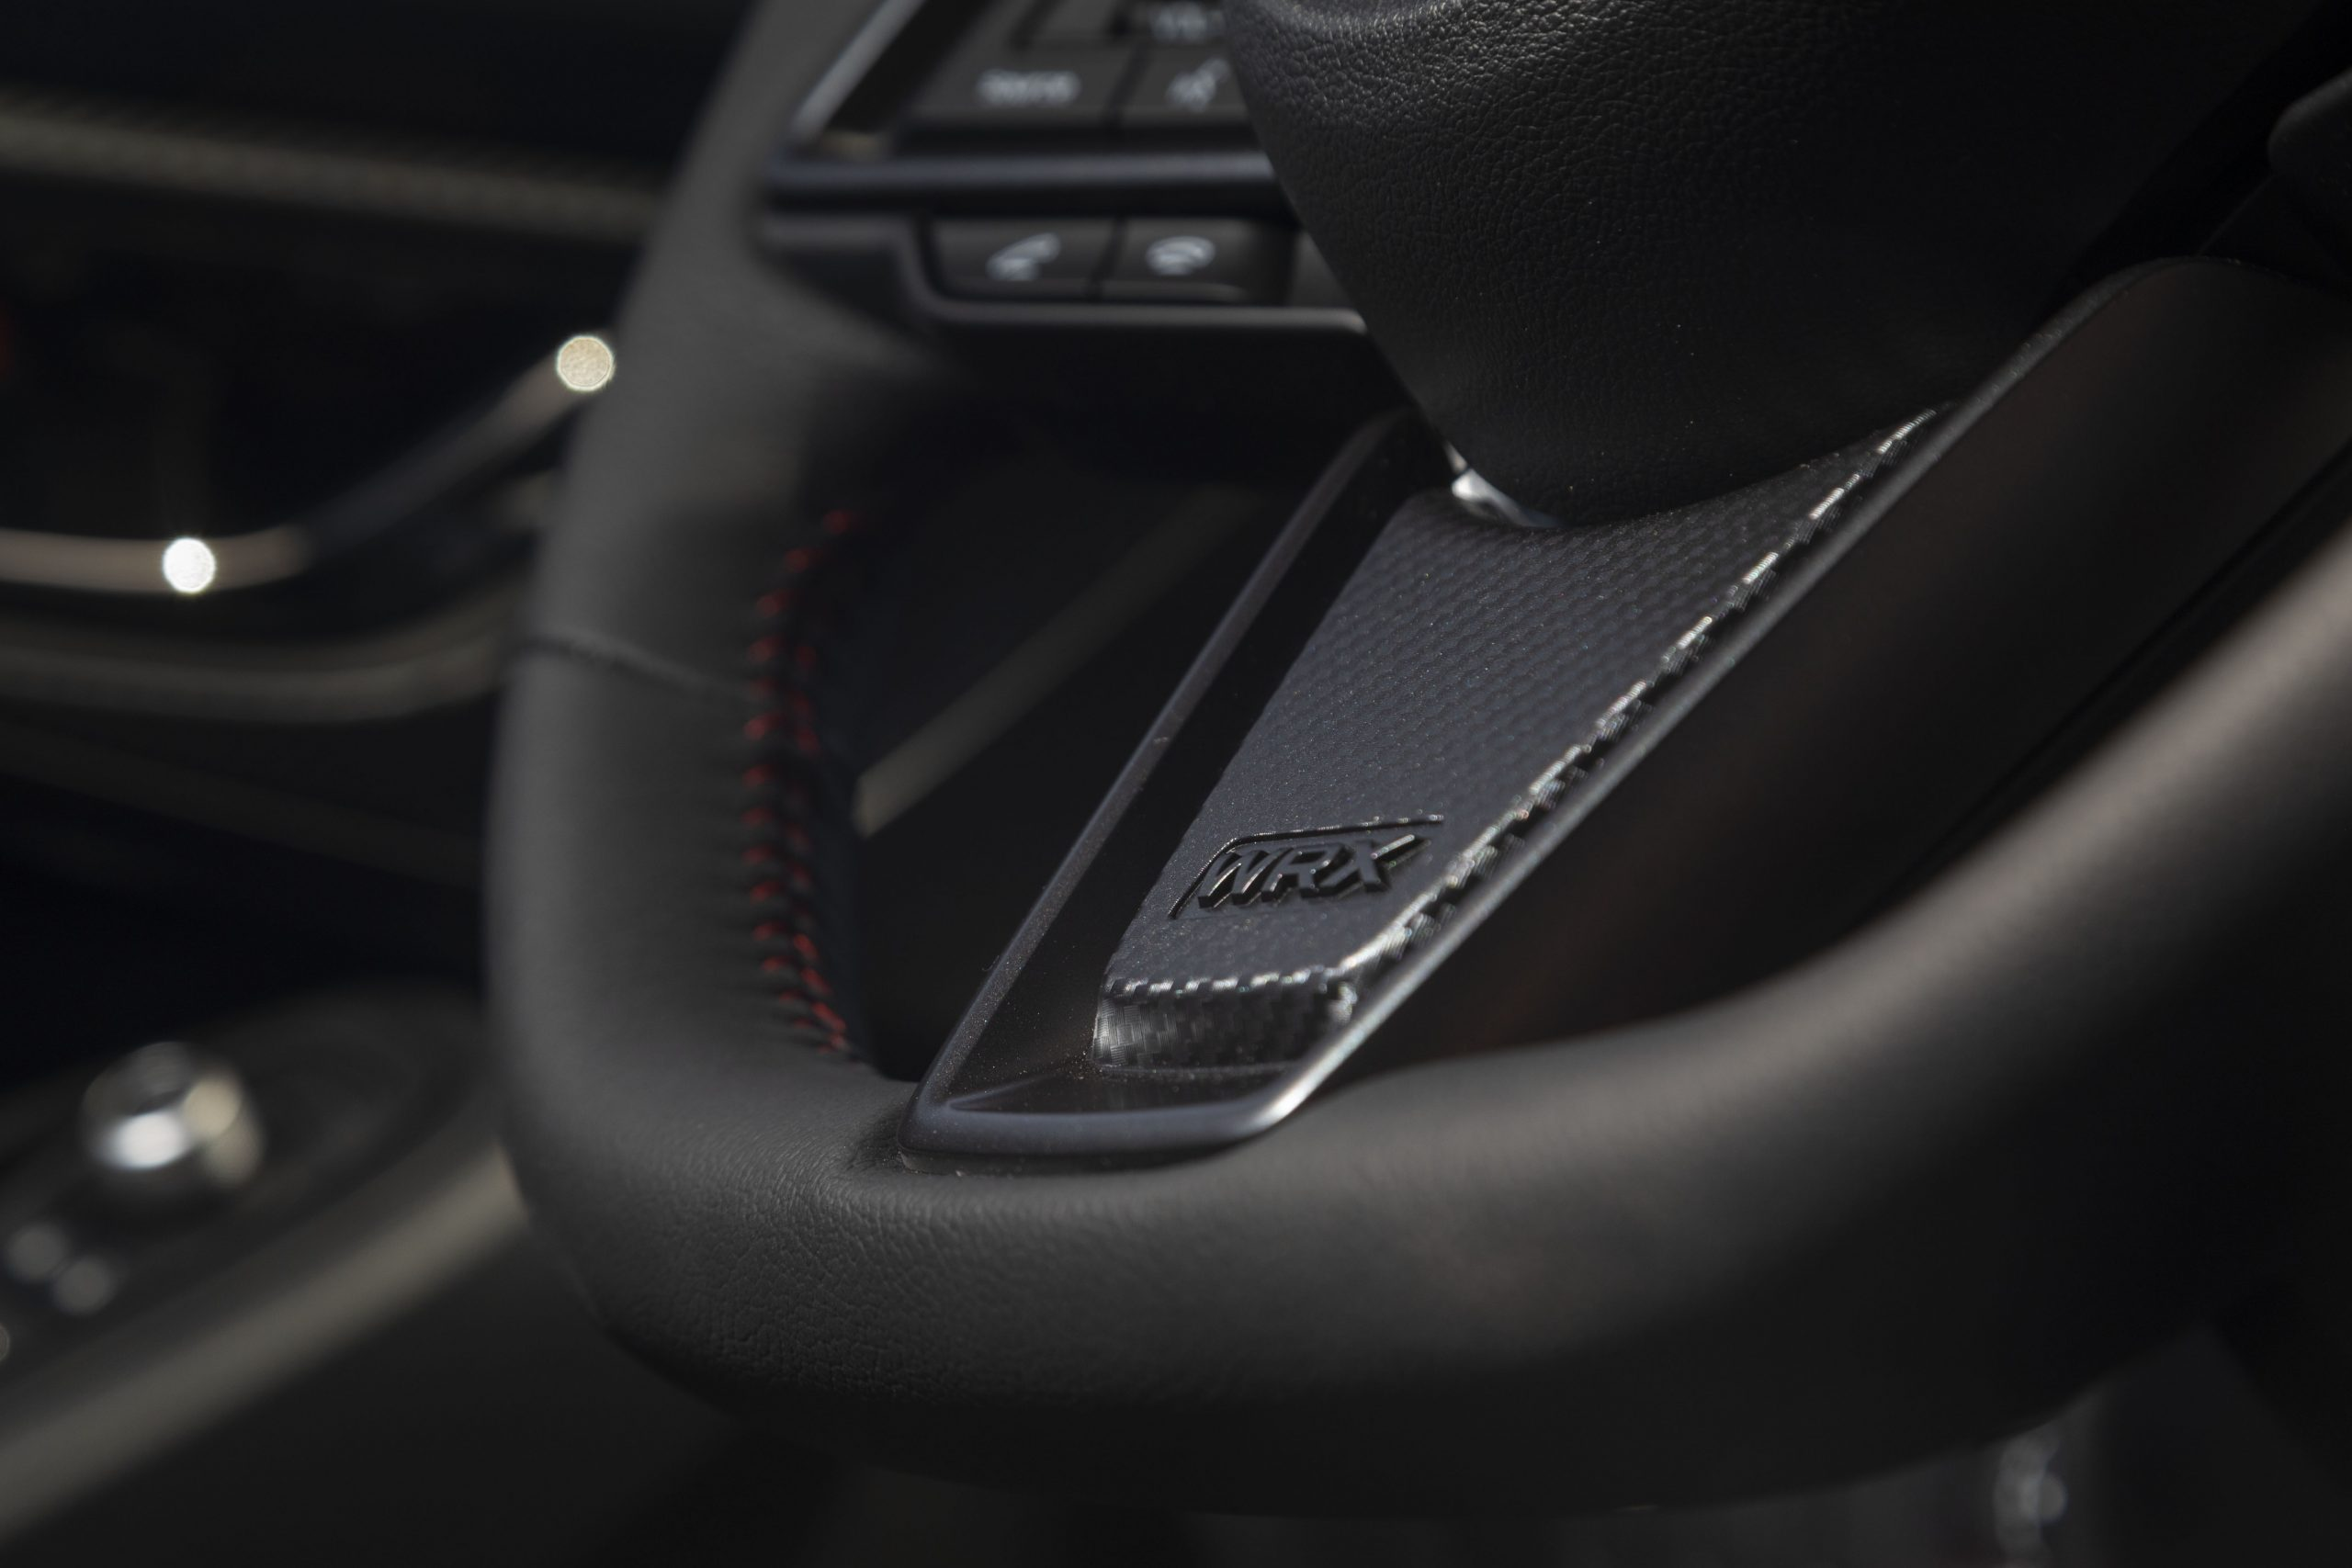 2022 Subaru WRX interior steering wheel detail